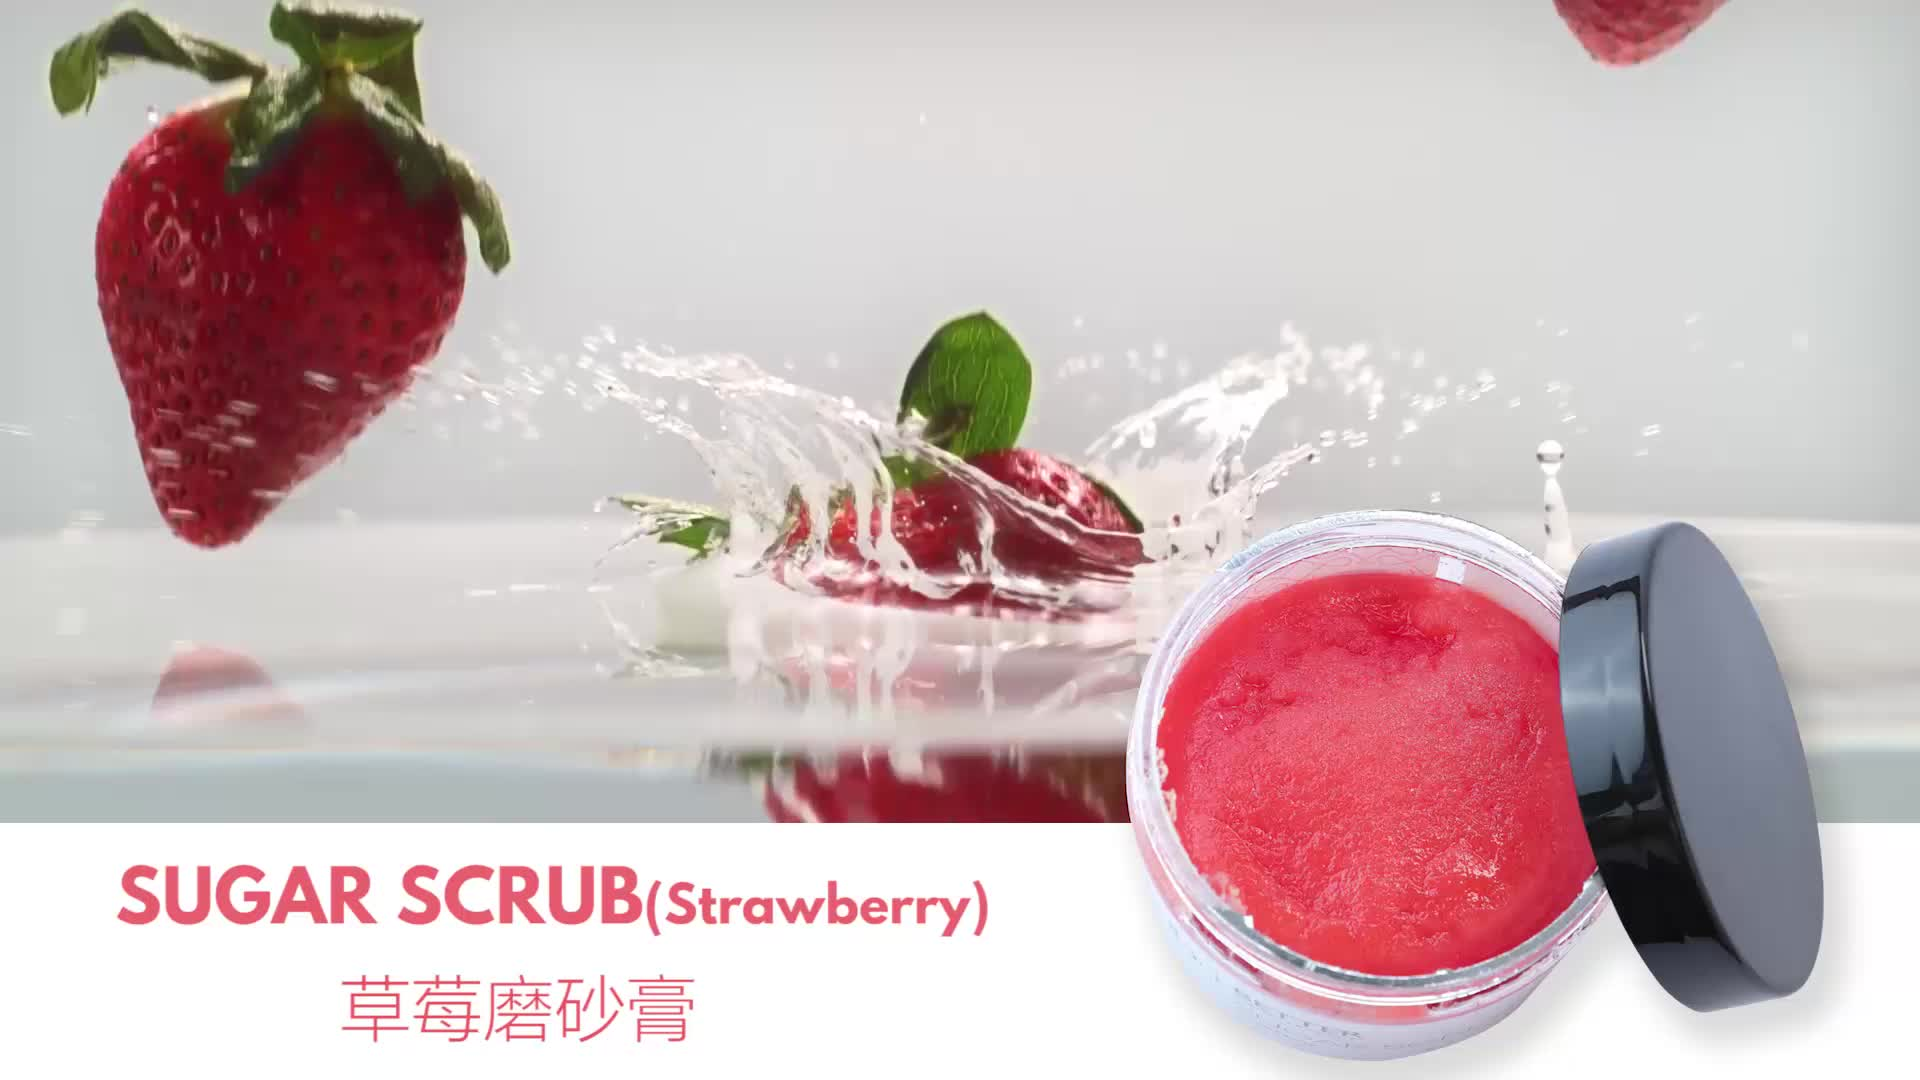 Marque privée Naturel Nettoyage En Profondeur Exfoliaor fraise gommage corporel